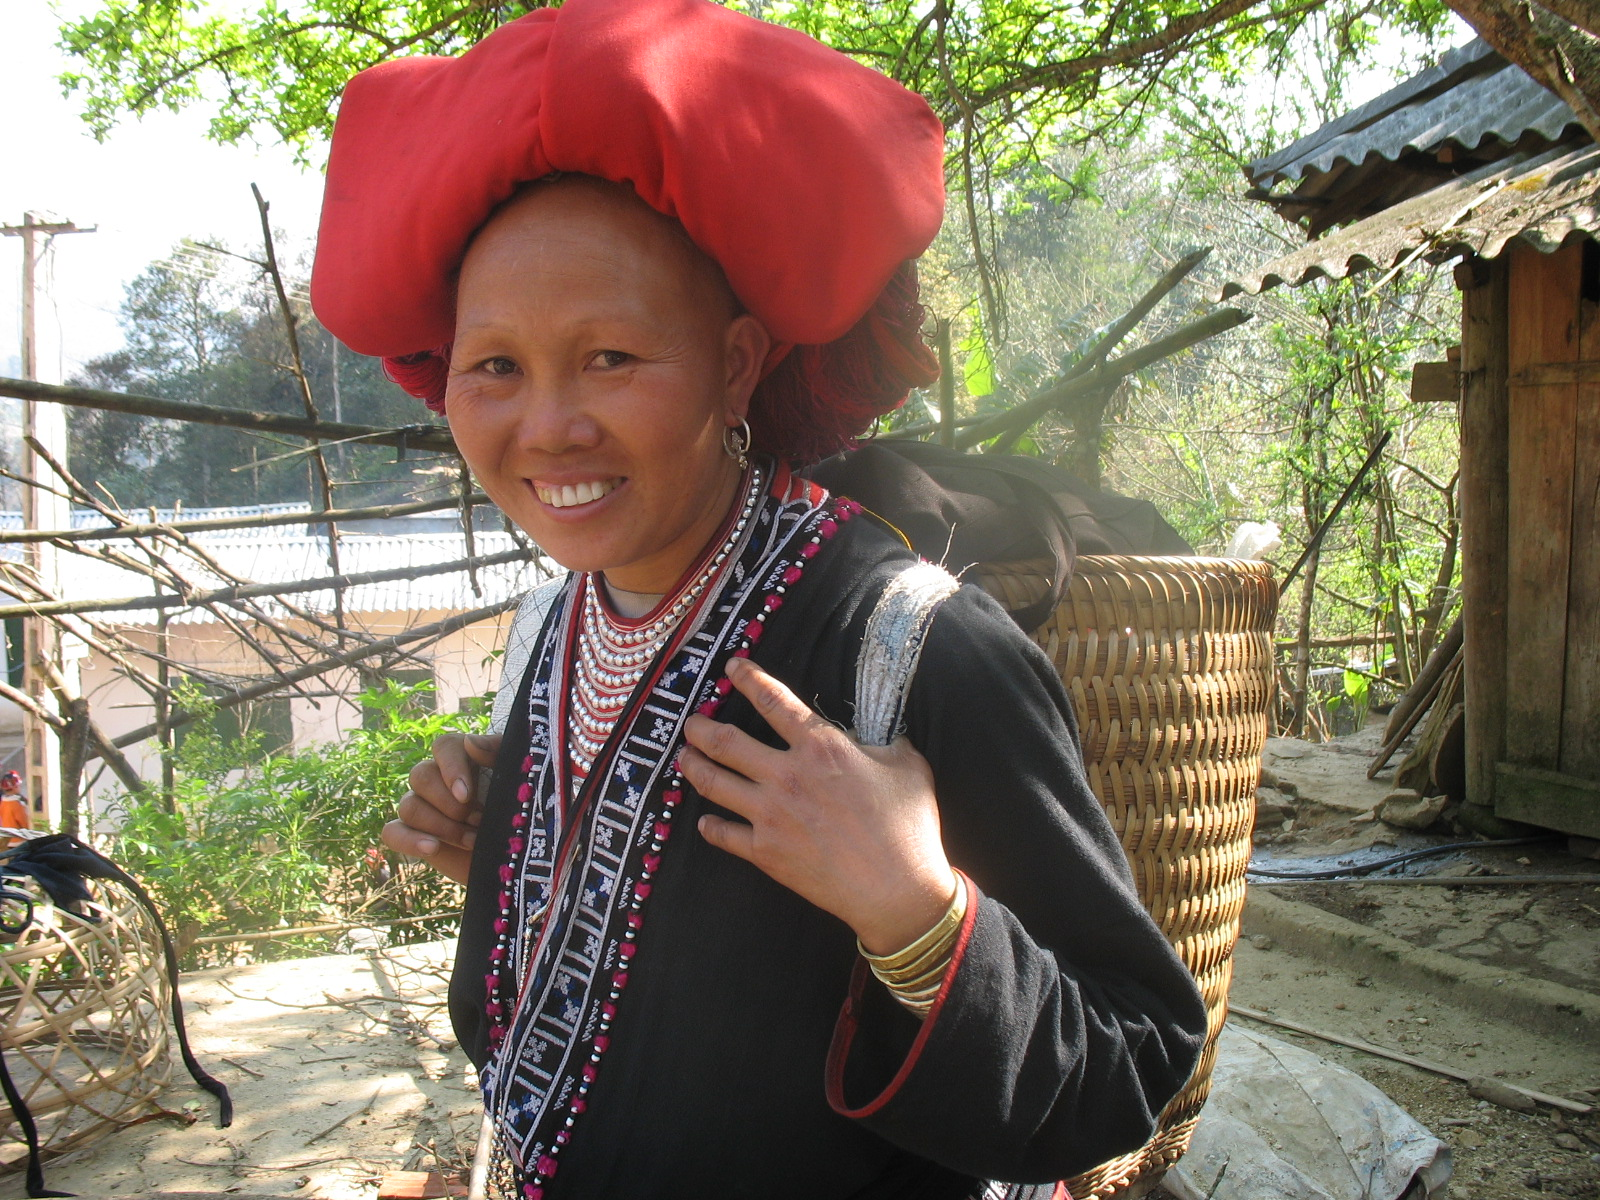 Voyage nord Vietnam hors es sentiers battus Lolo noir